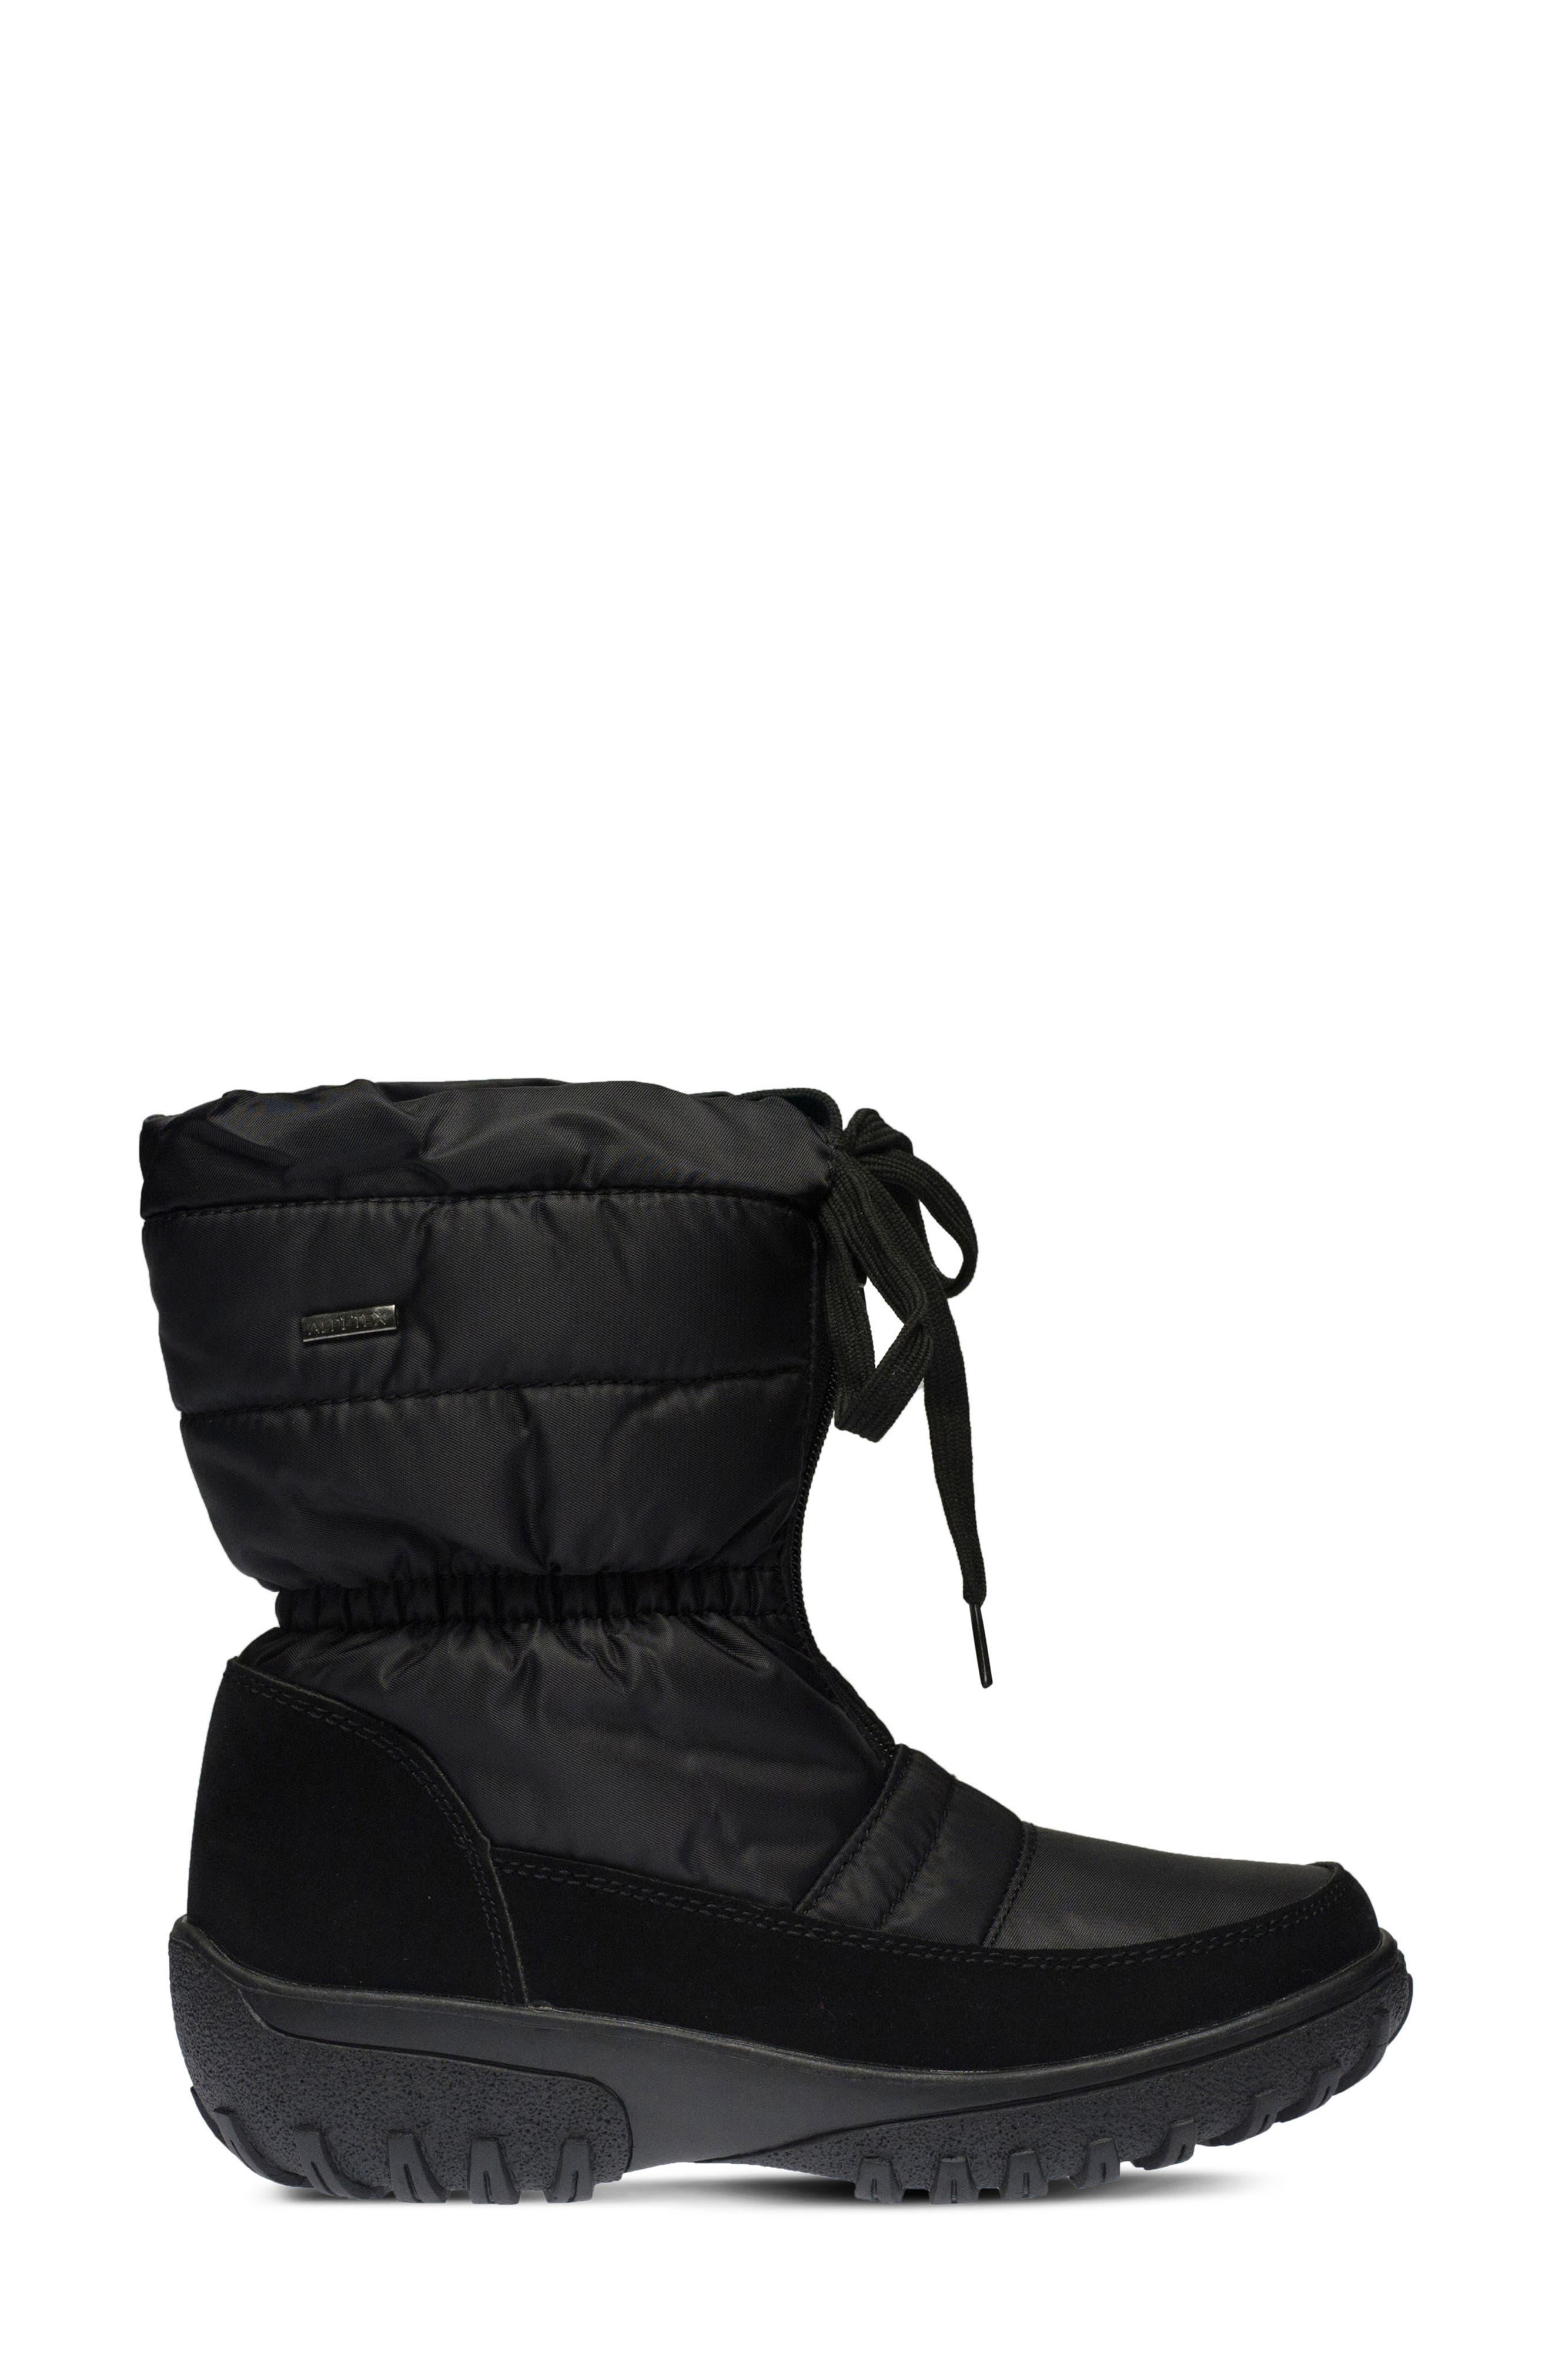 Lucerne Waterproof Drawstring Boot,                             Alternate thumbnail 3, color,                             Black